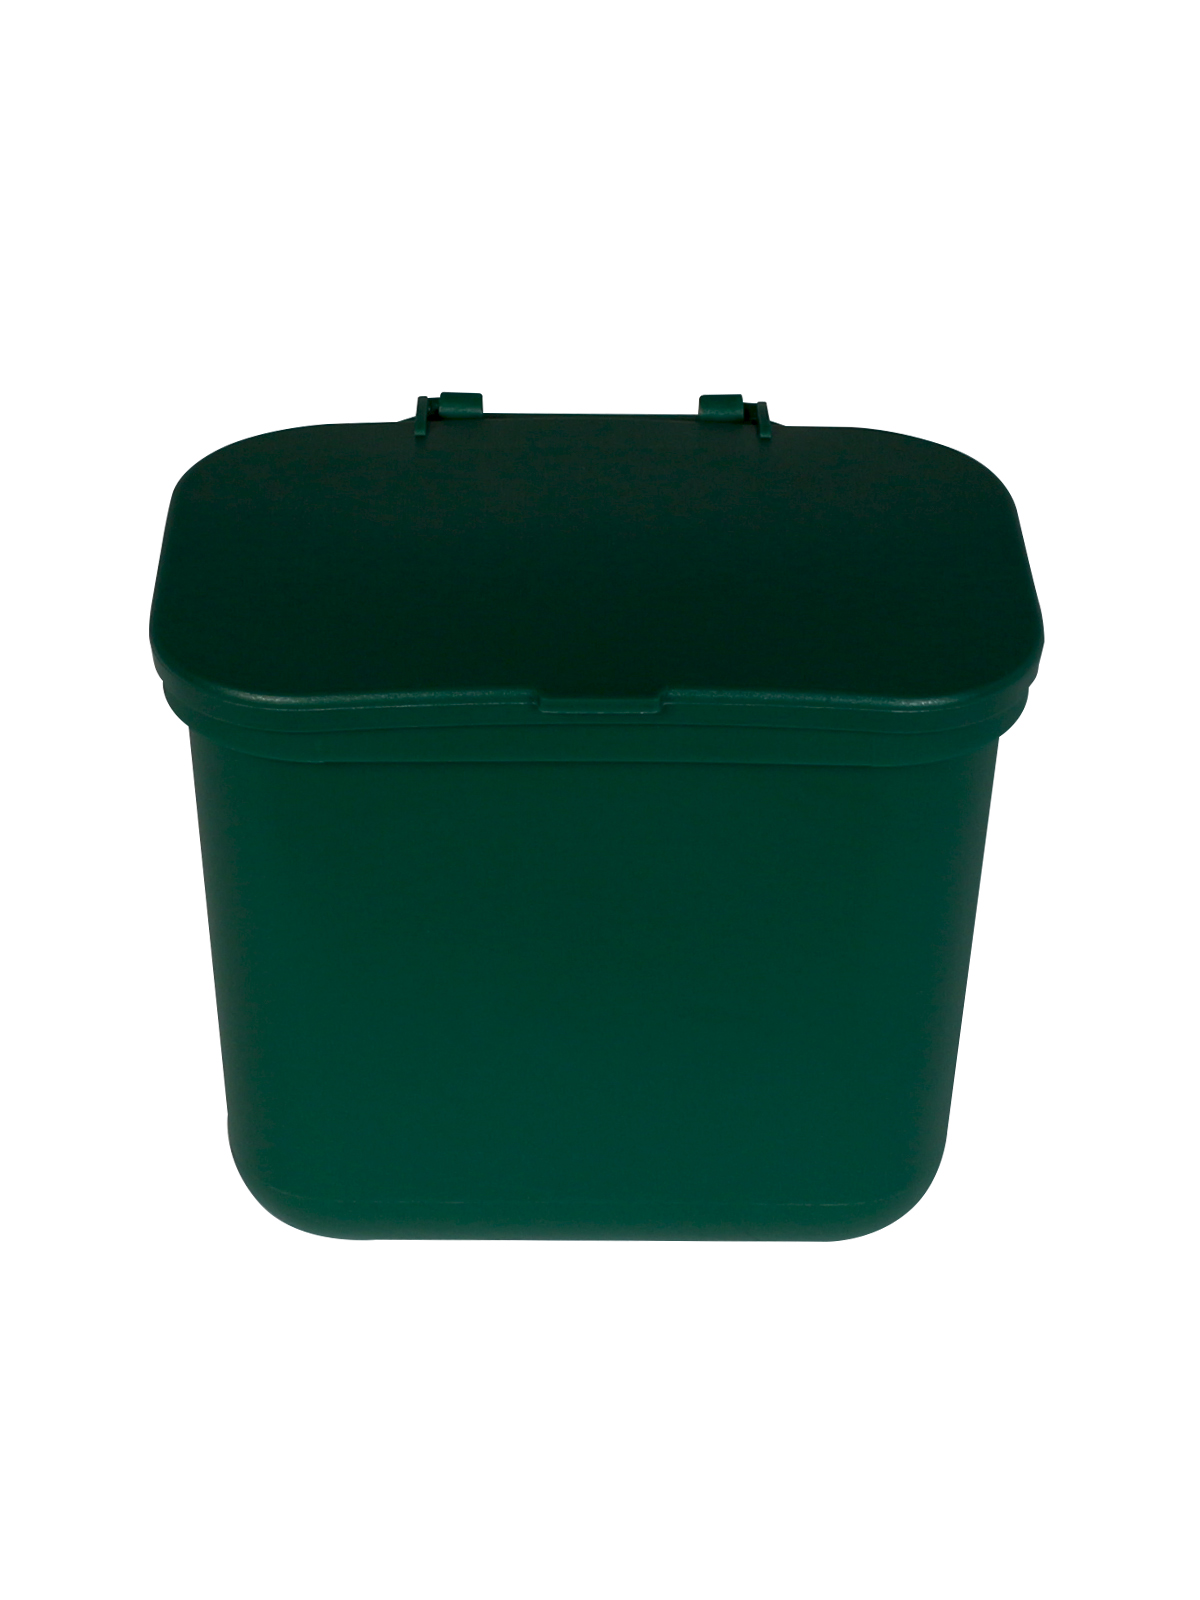 HANGING WASTE BASKET - Single - Solid Lift - Green